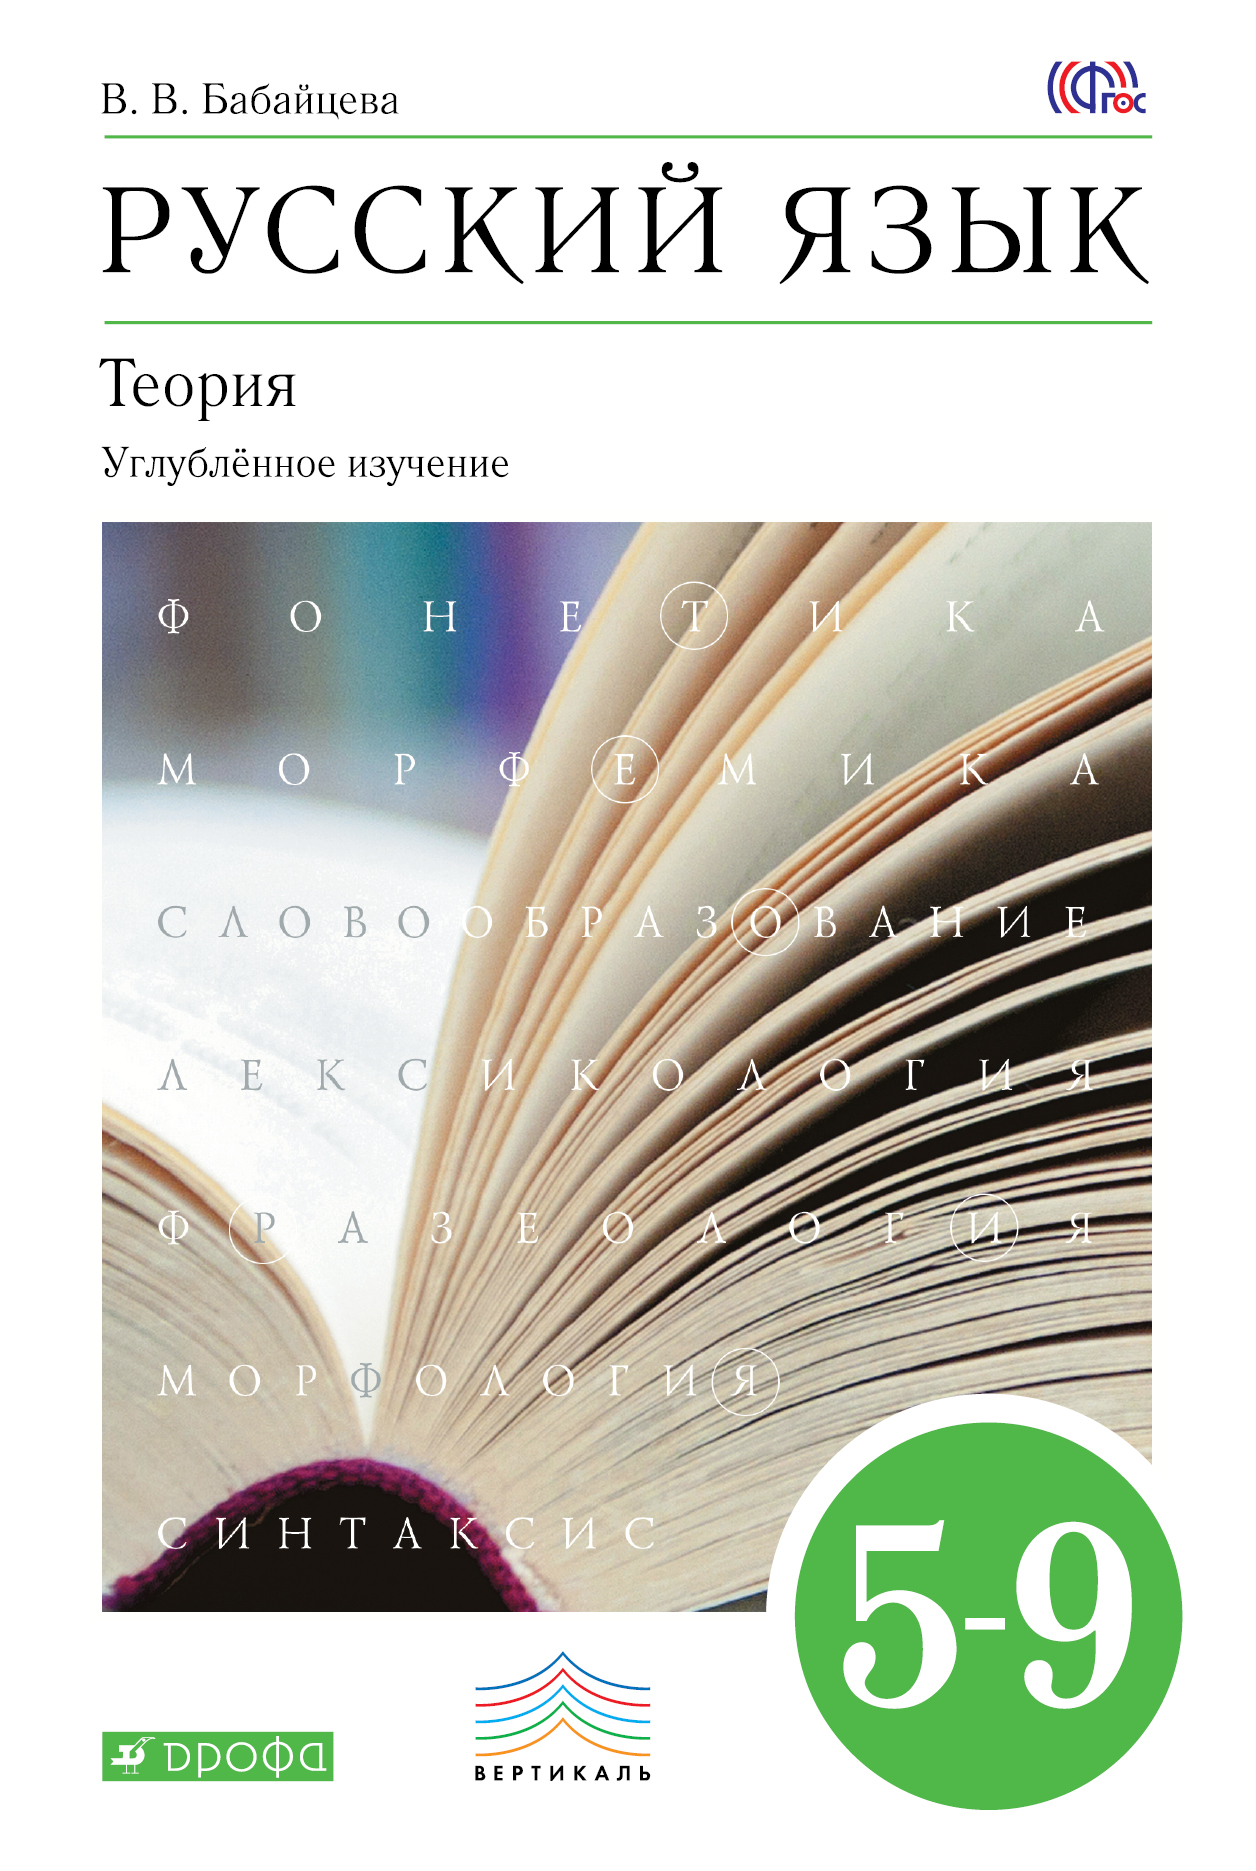 Гдз по русскому 6 7 класс теория